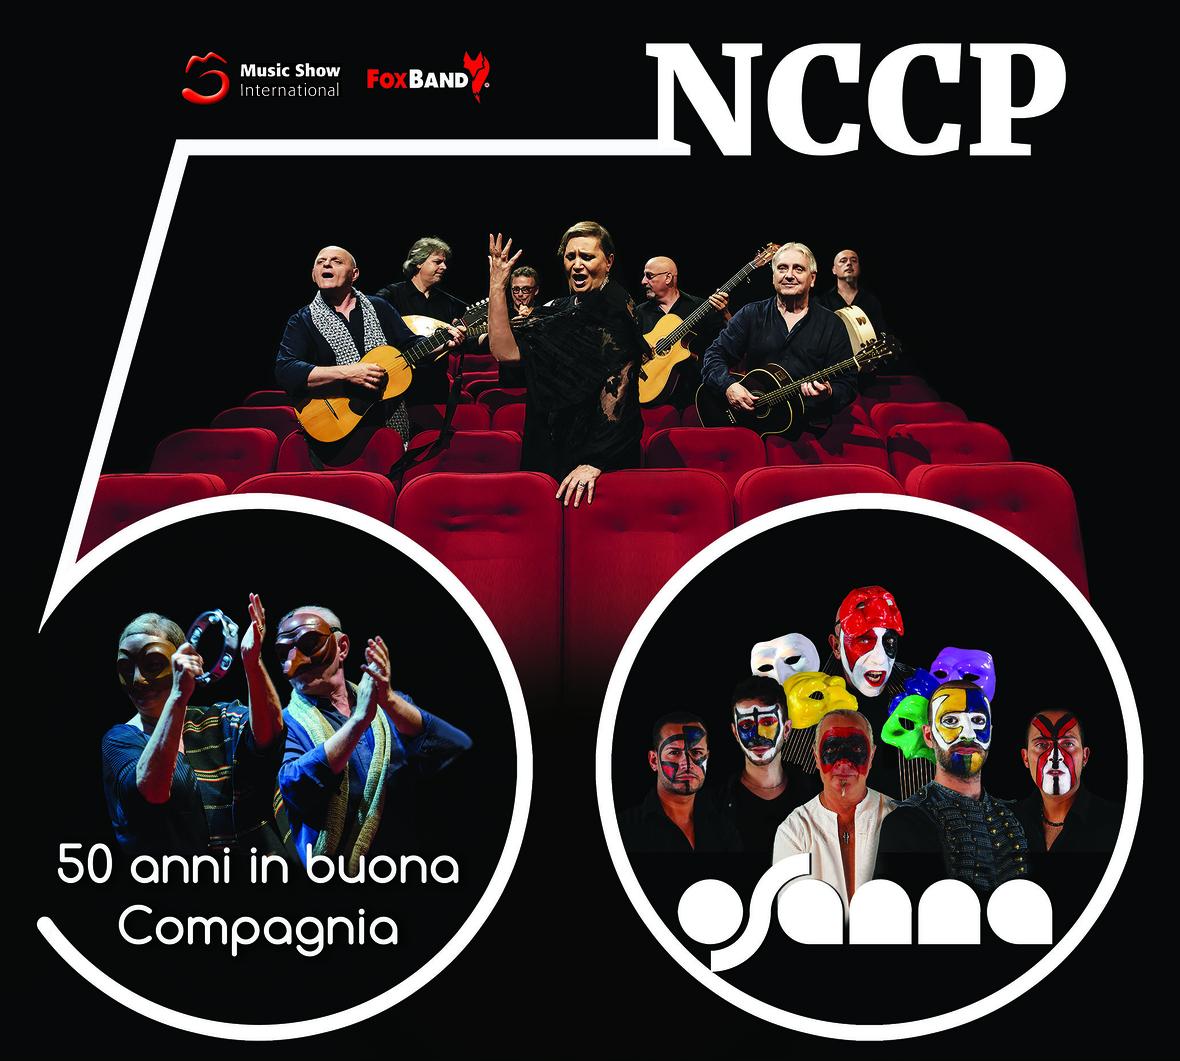 NCCP E OSANNAOKAY